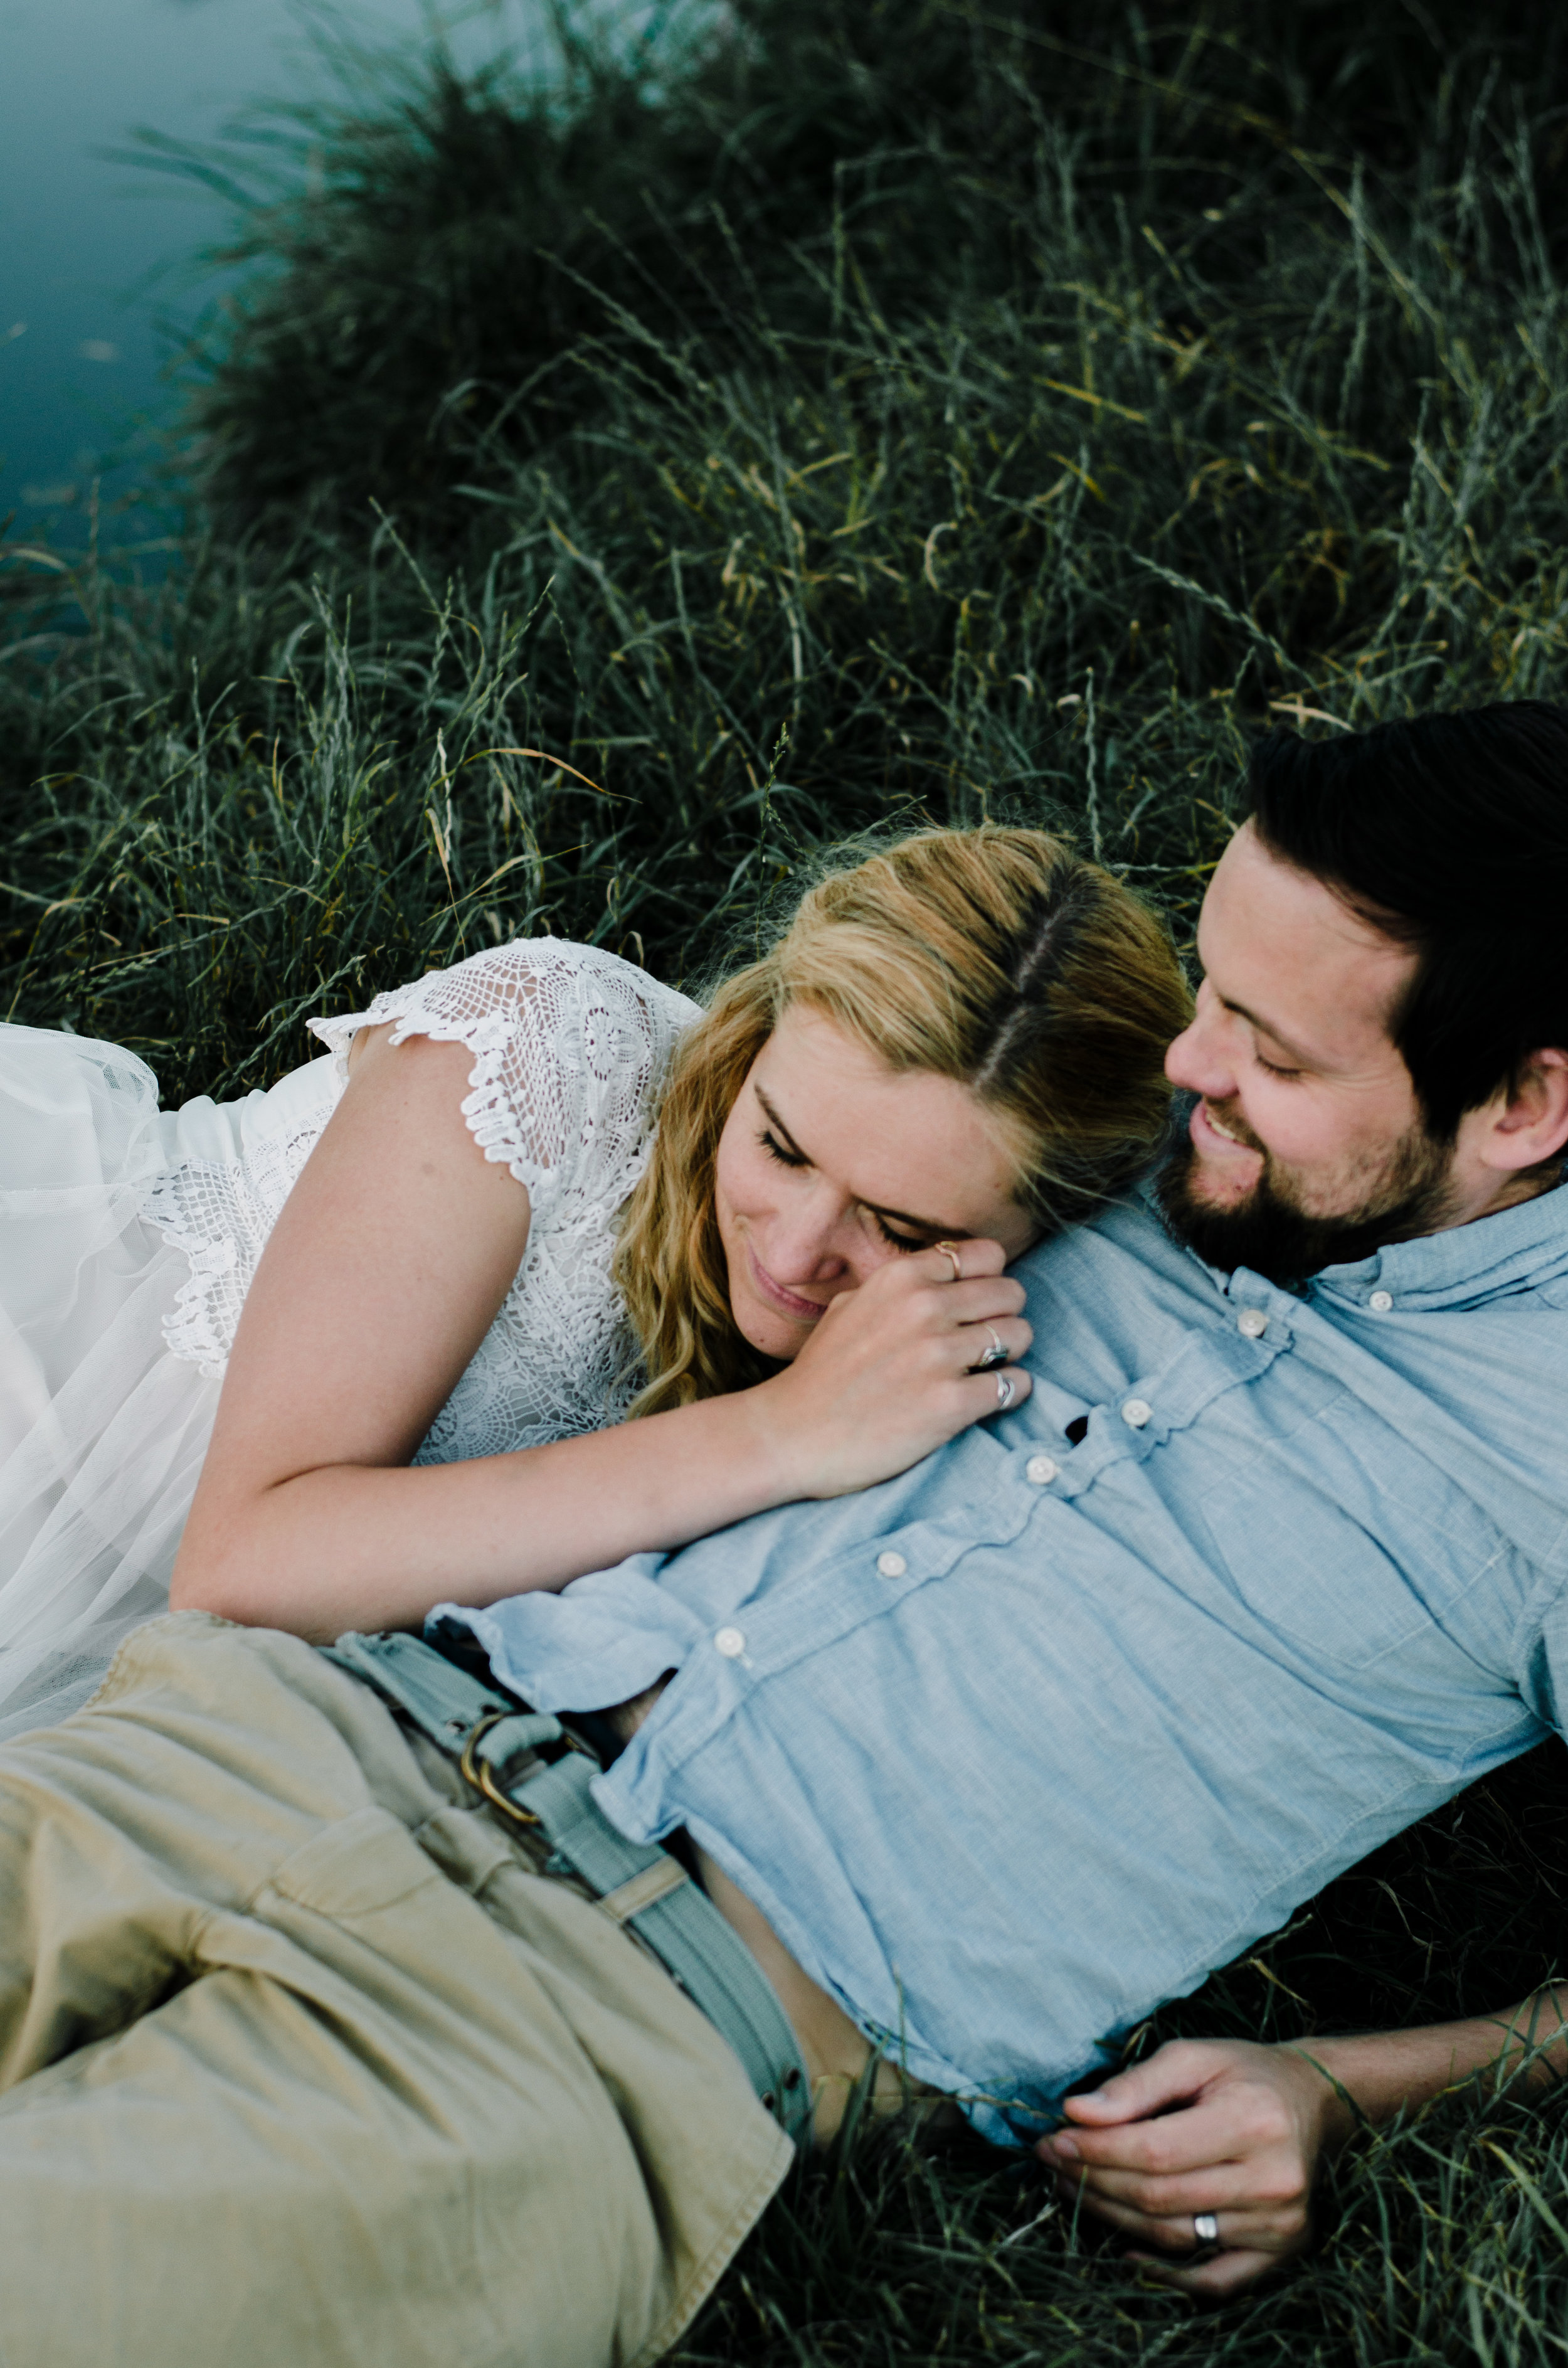 Gina & Chris - Barcombe Mills - Couple Session - Aiste Saulyte Photography-54.jpg